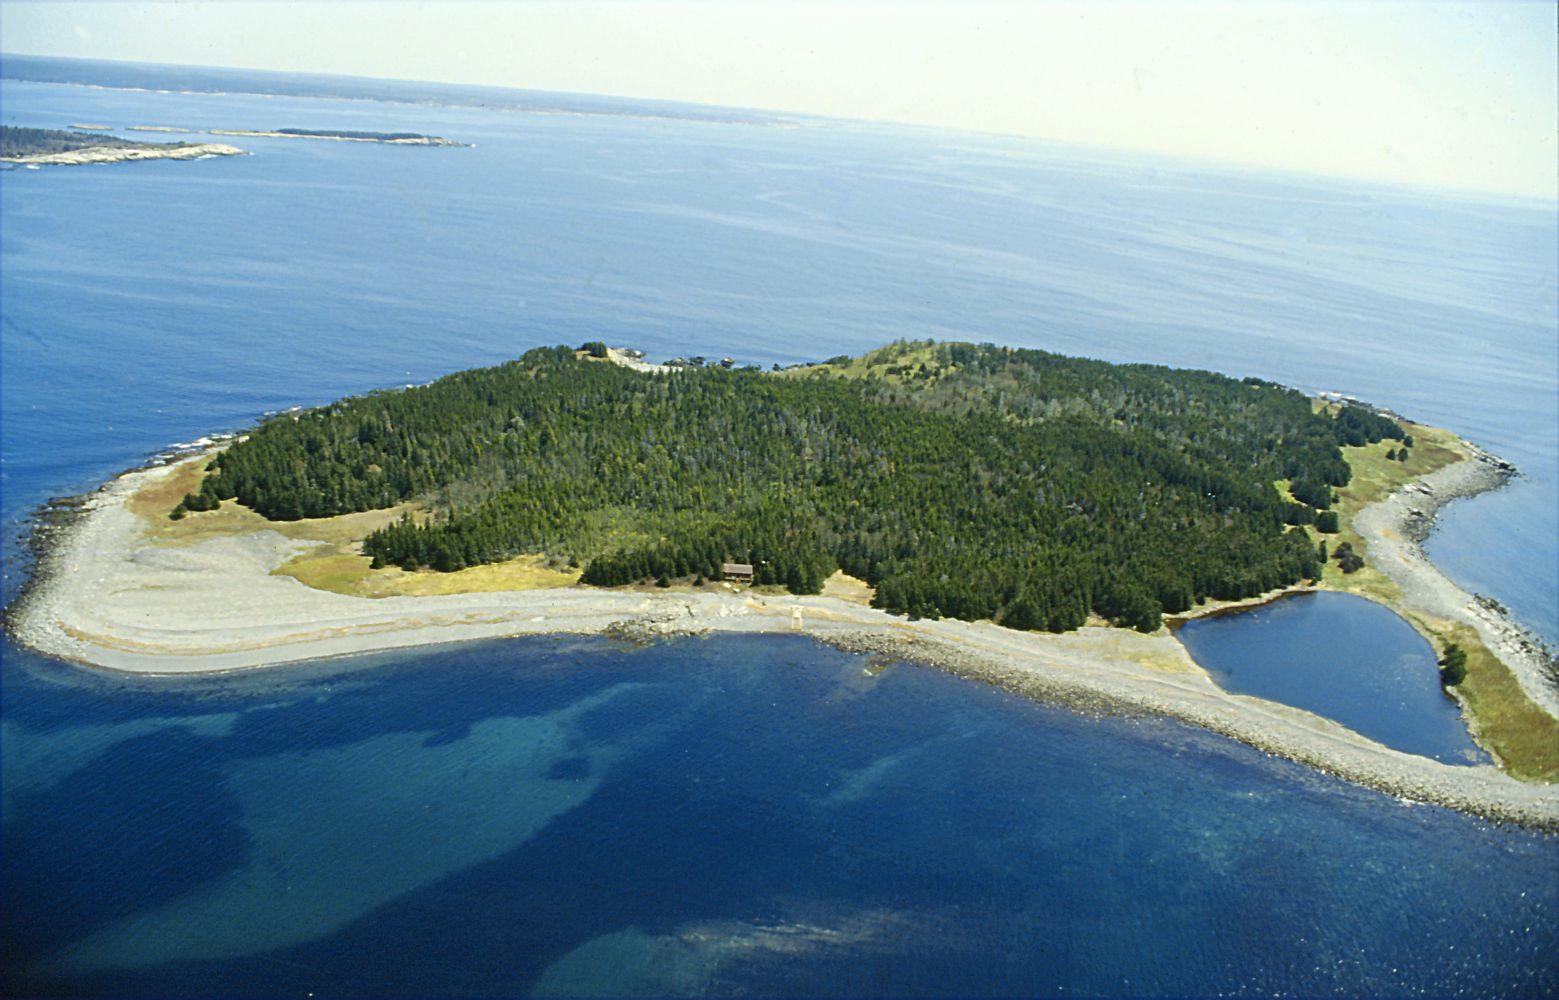 Gravel Island off the coast of Nova Scotia, Canada